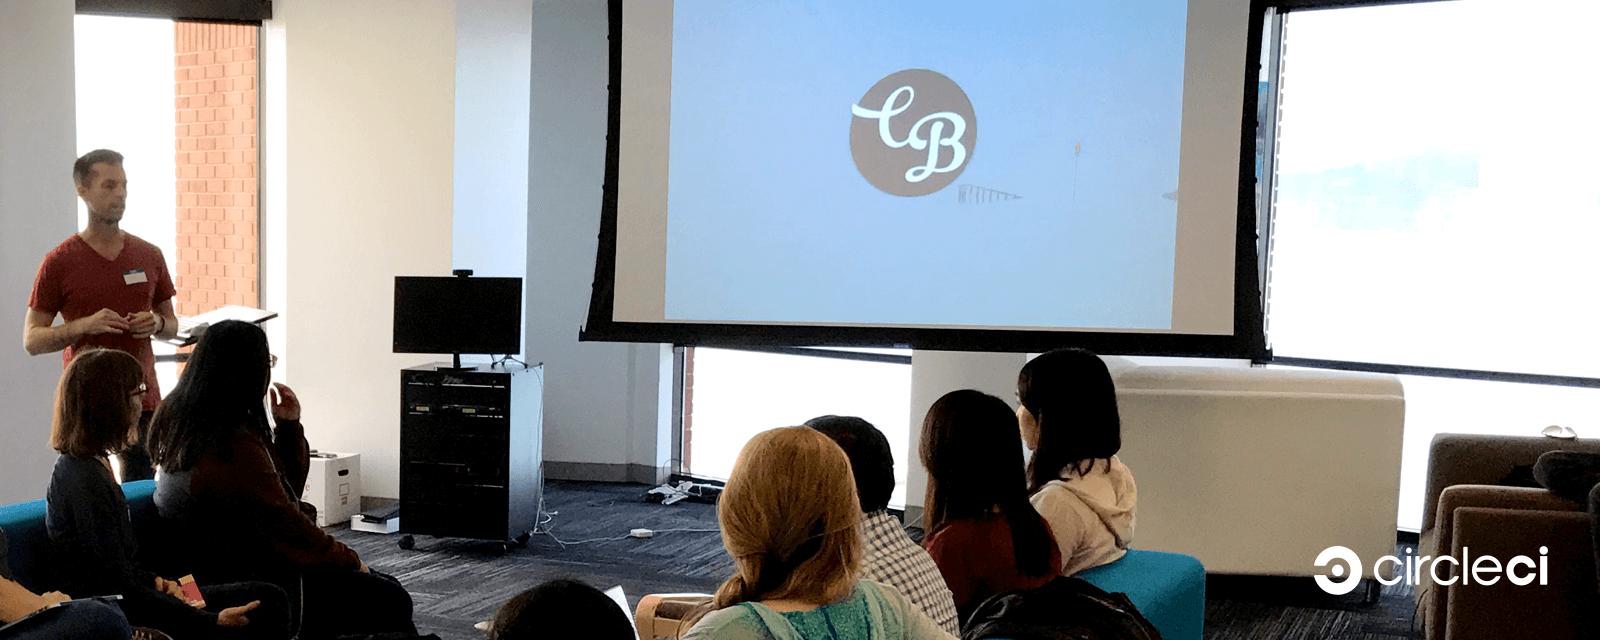 A_CB_BlogHeader-1.png